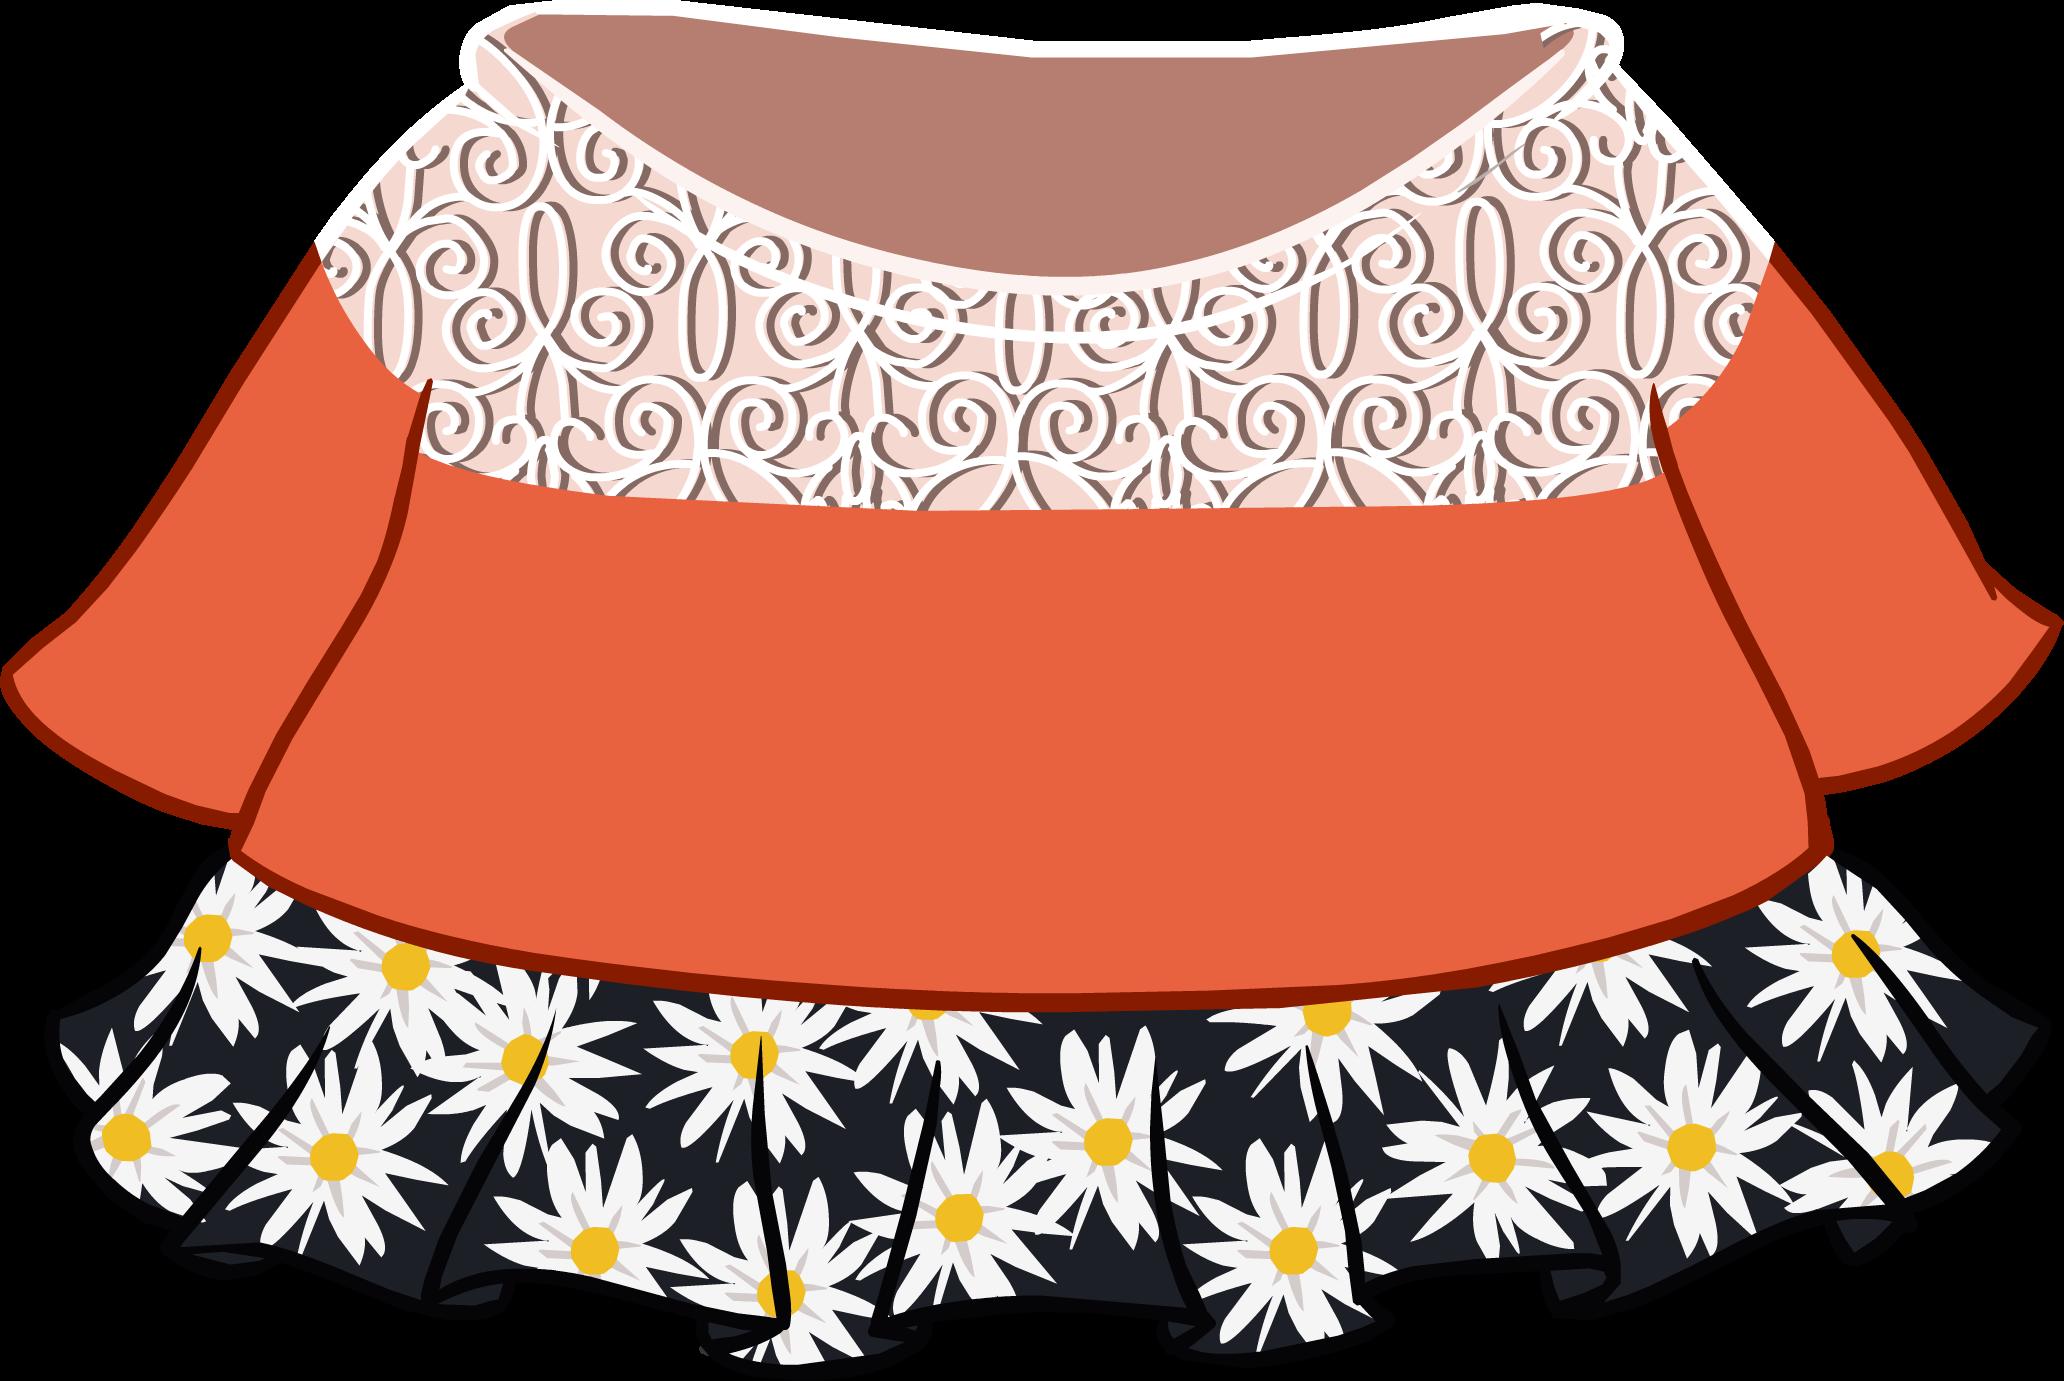 Autumn Floral Outfit